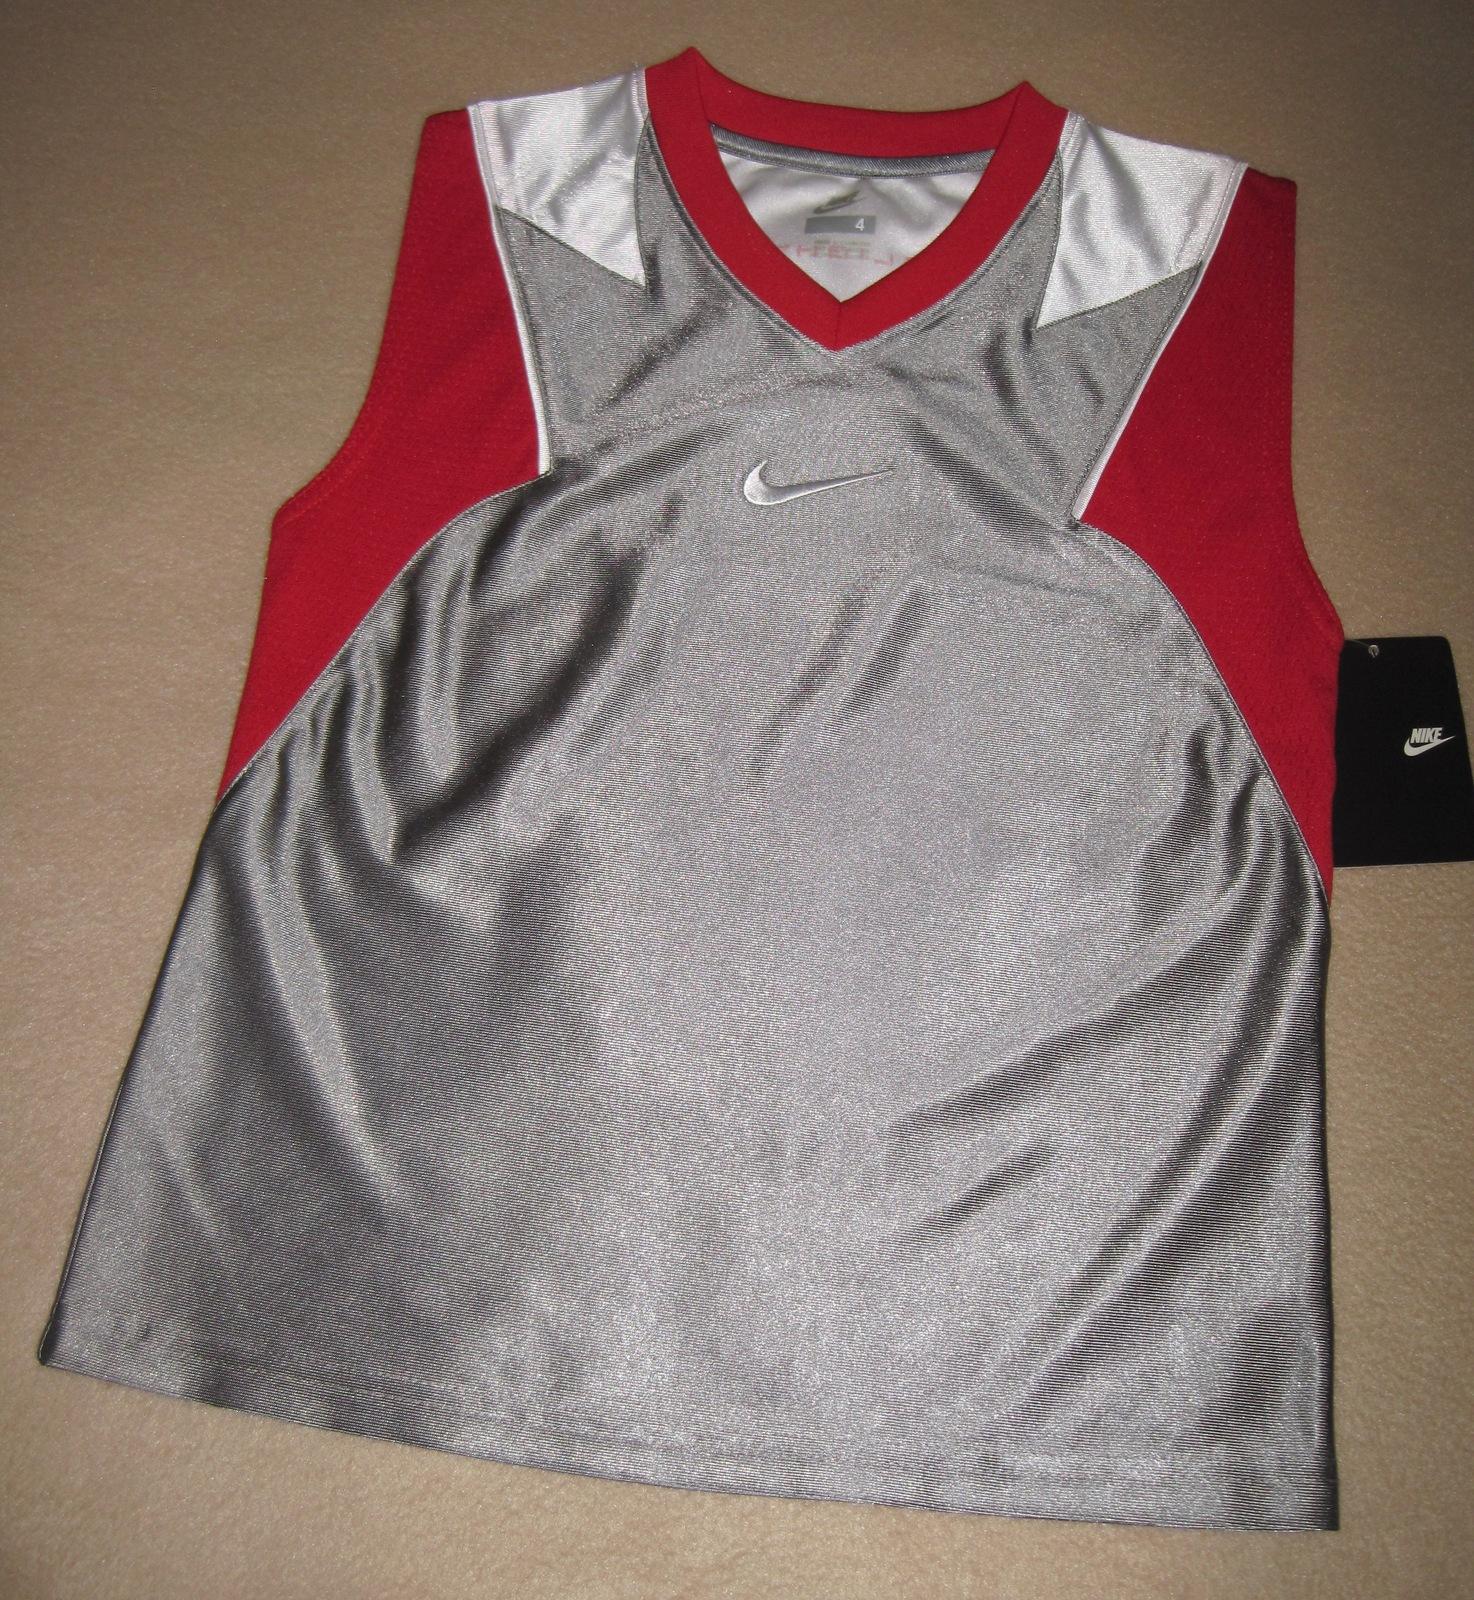 BOYS 6 - Nike - Flight Grey-Red-White BASKETBALL SPORTS JERSEY